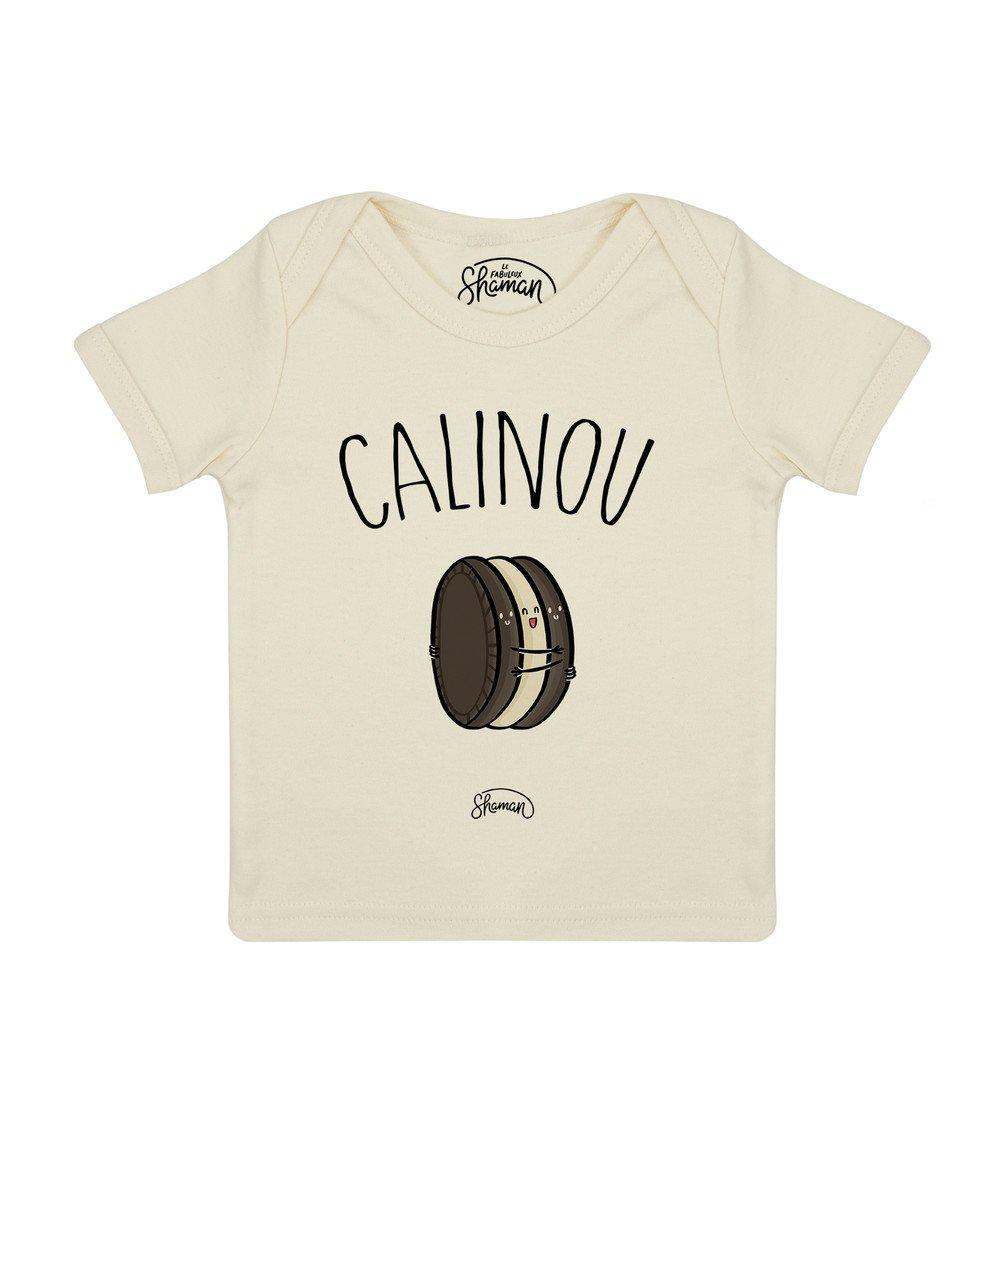 Tee shirt Calinou